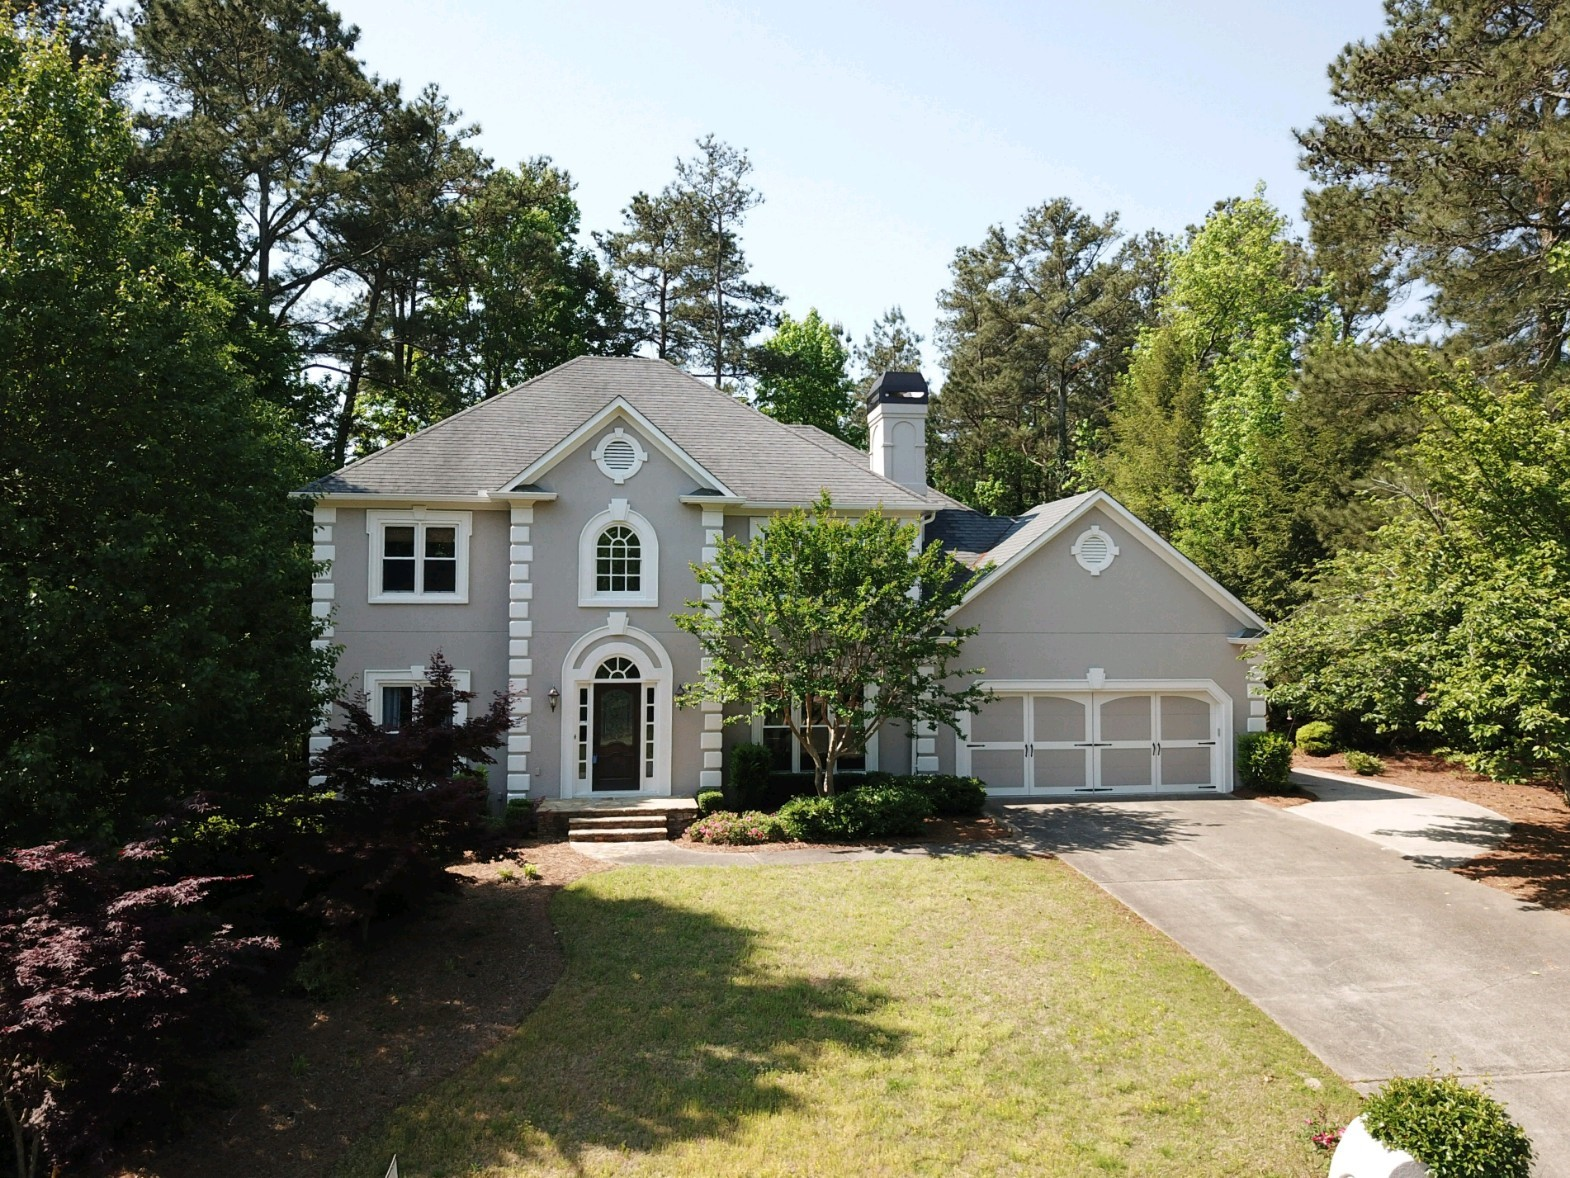 Home Inspection - East Cobb / Marietta, GA